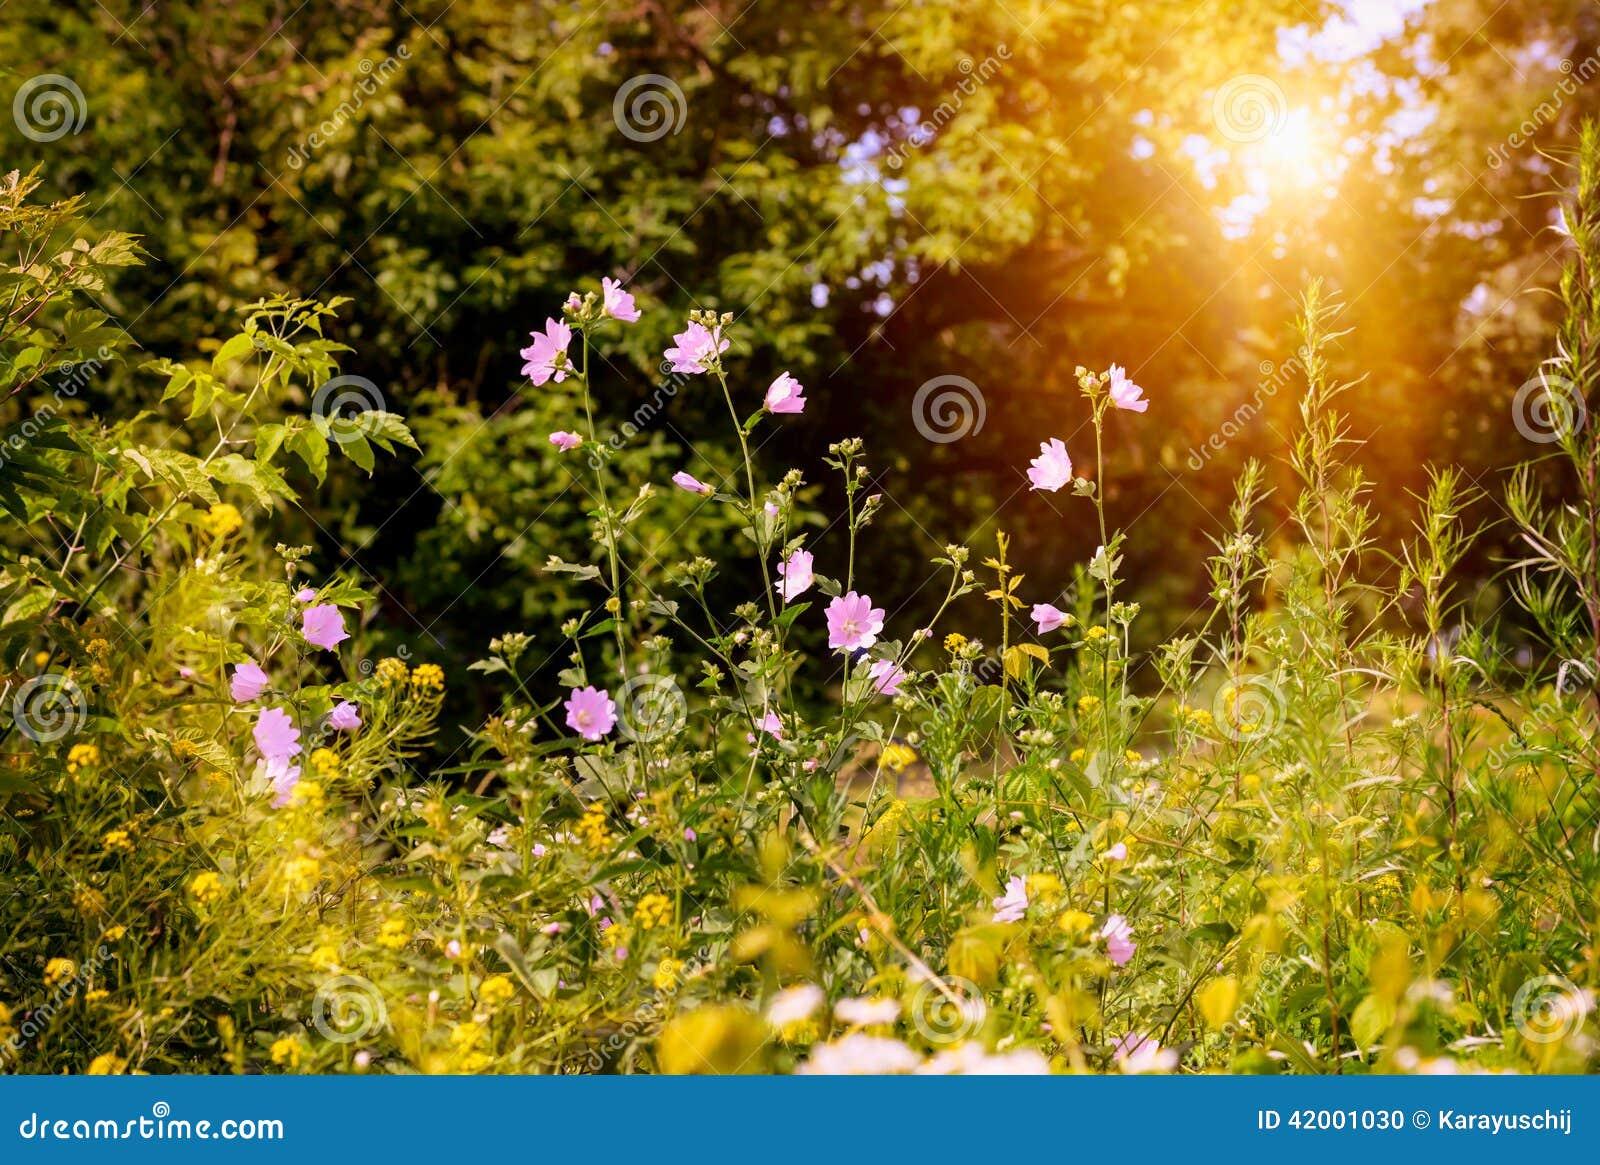 fleurs sauvages roses photo stock image du sunset soir e. Black Bedroom Furniture Sets. Home Design Ideas